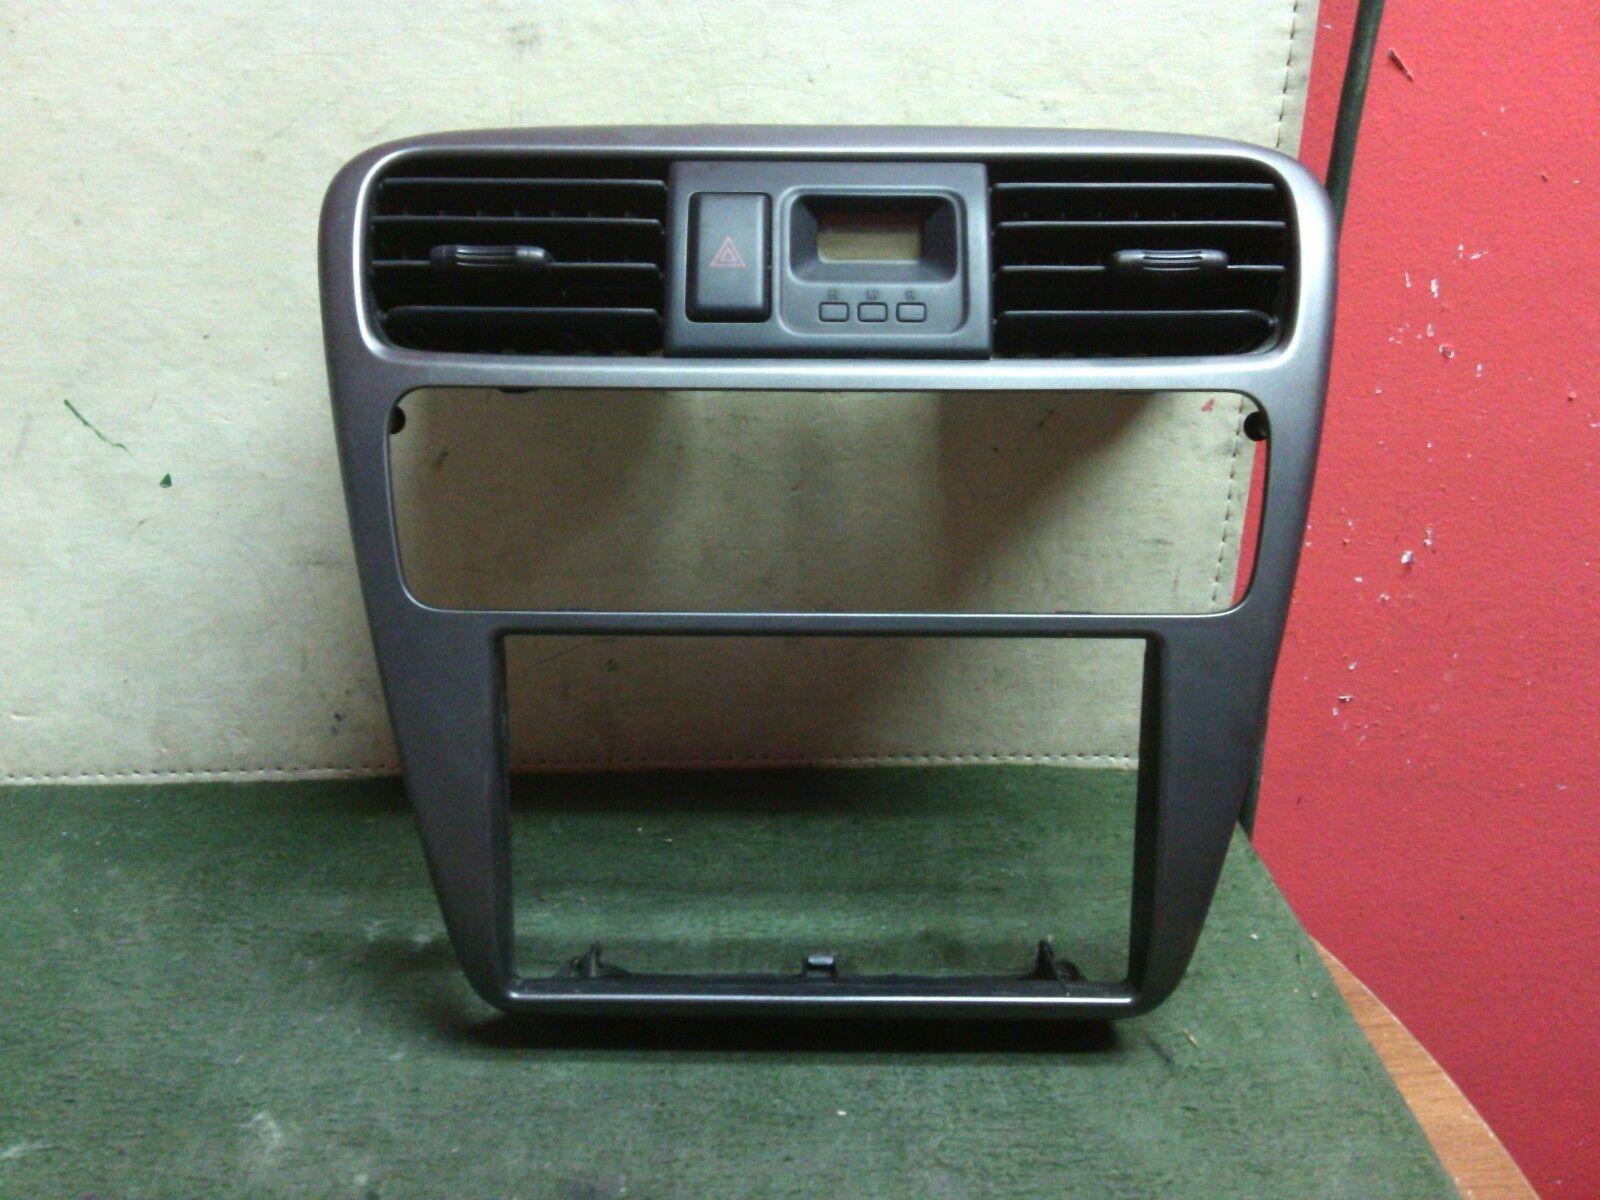 Used 2001 Honda Accord Dash Parts For Sale Radio Two Door Bezel Oem Dark Gray